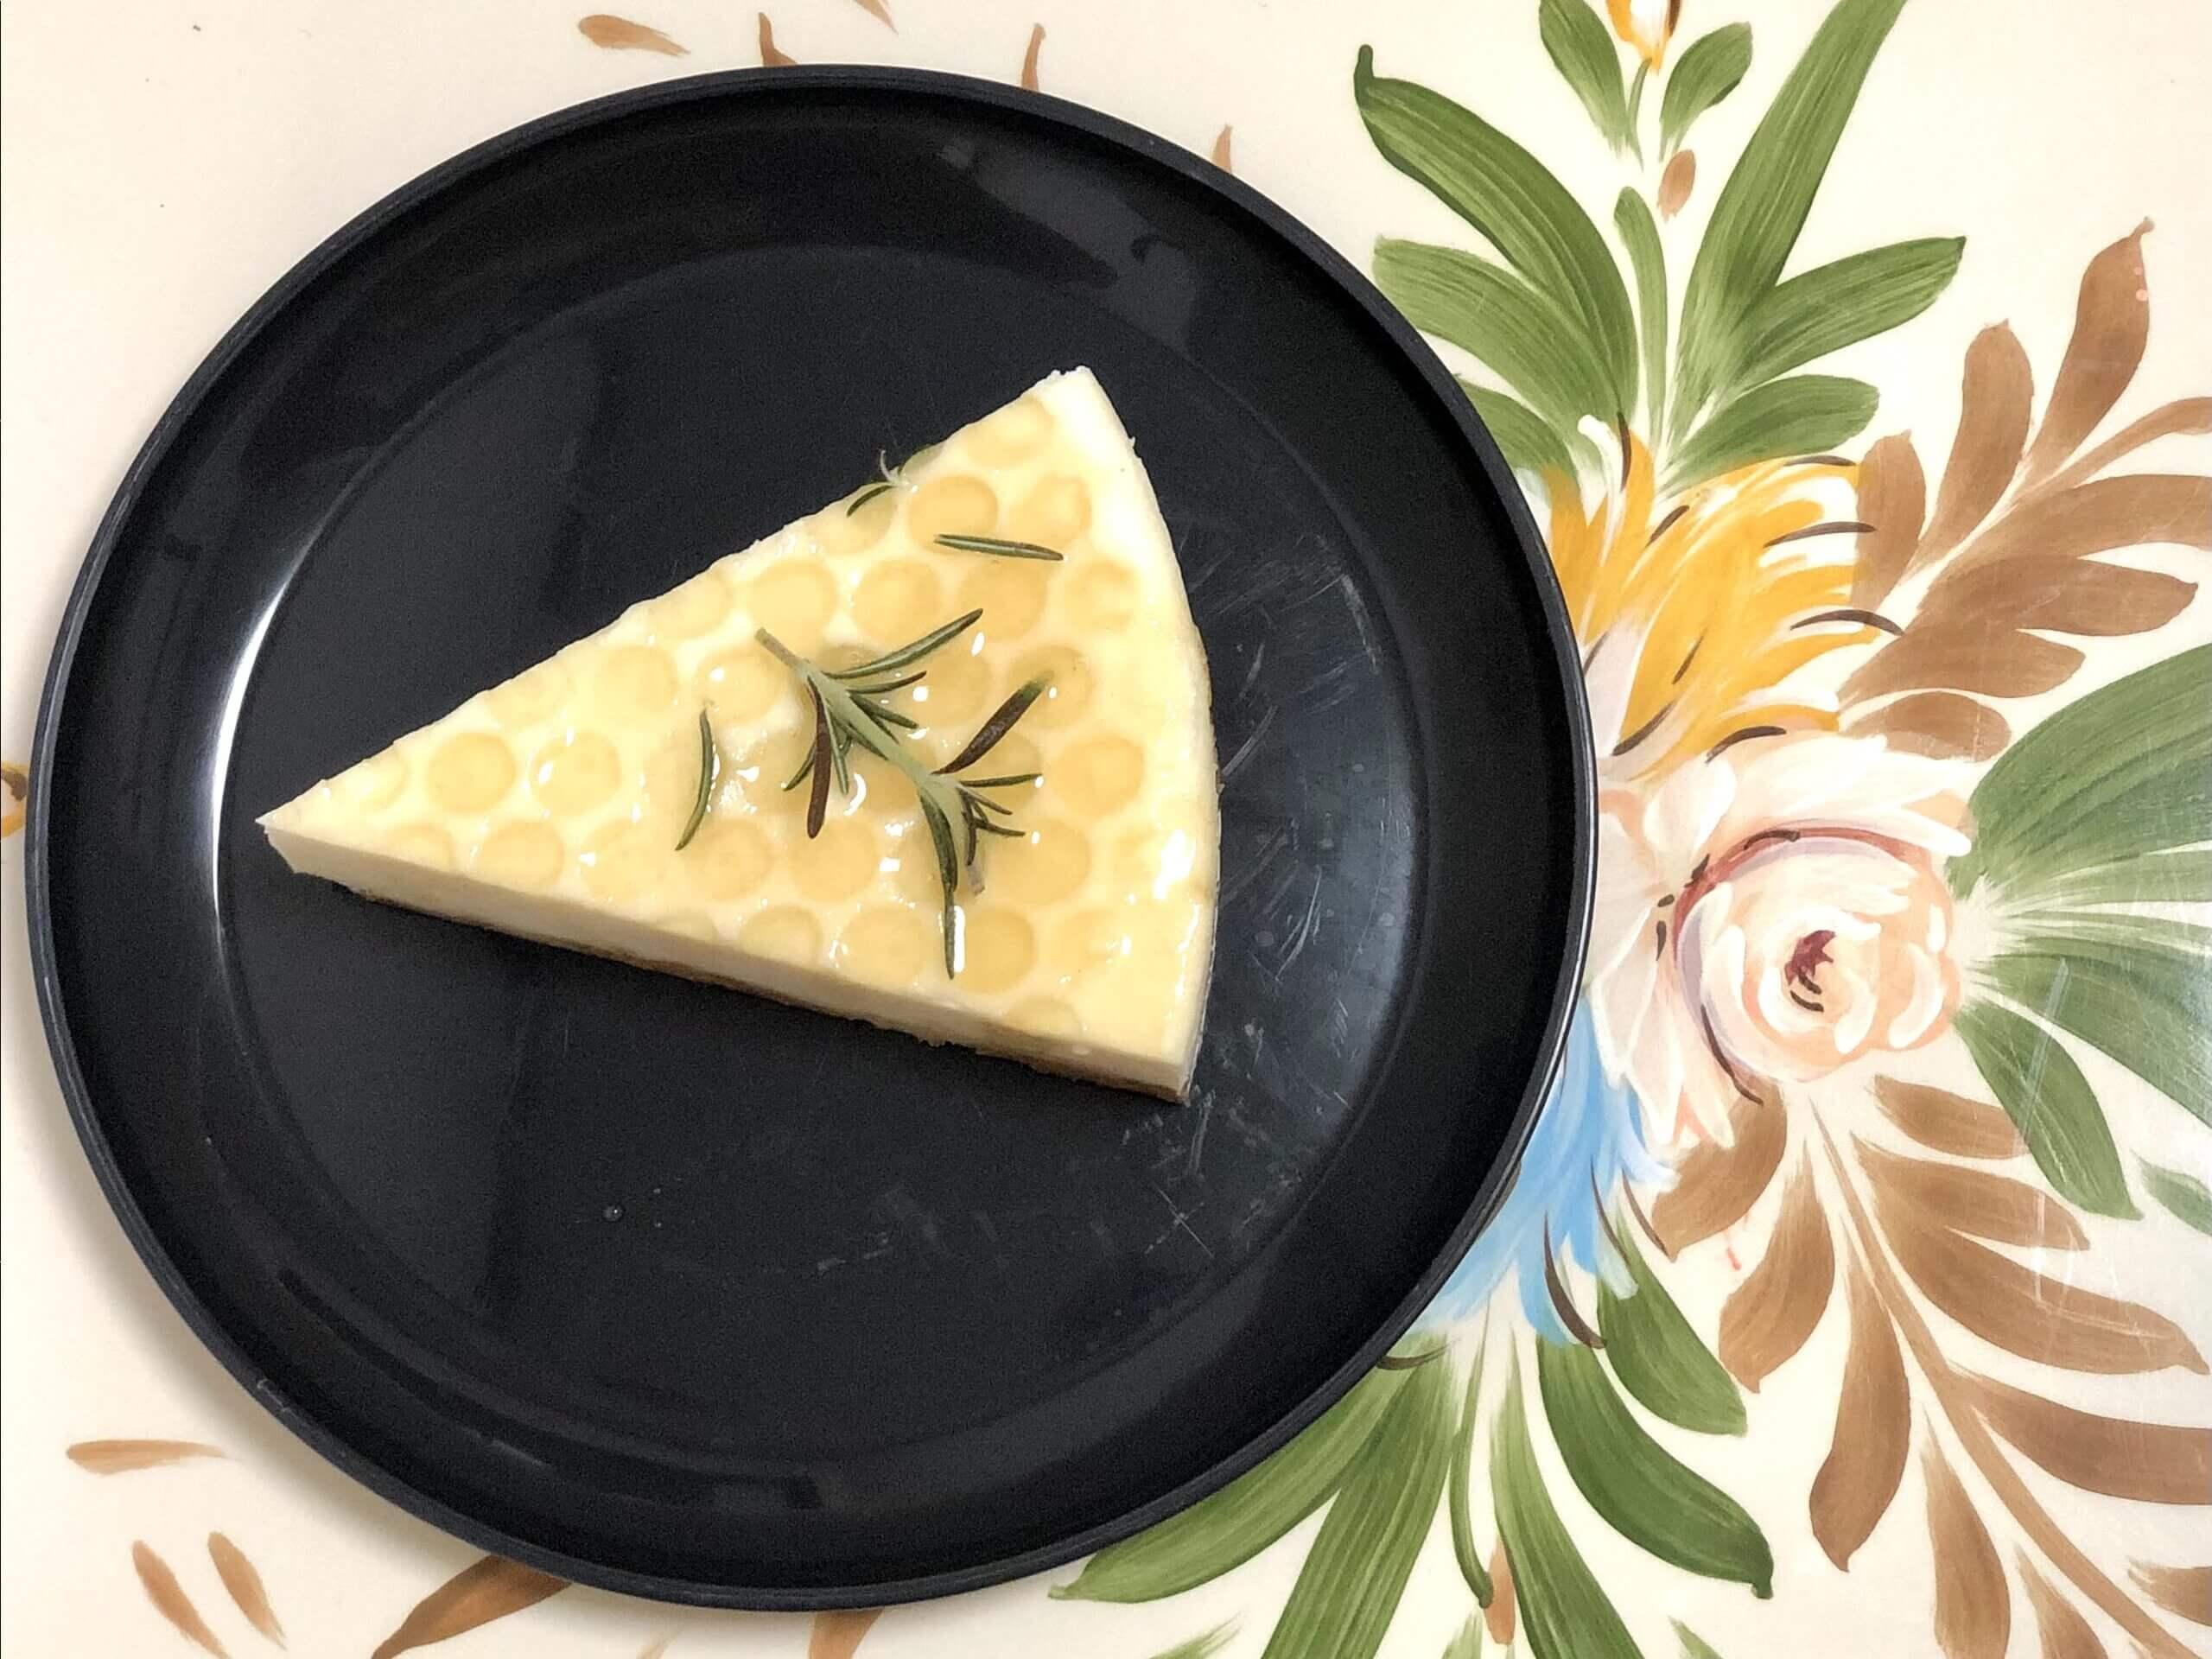 【Namery – ナメリ – 】気分に合わせてチーズケーキが選べる♪月限定の味もオススメです!《熊本市東区長嶺南》